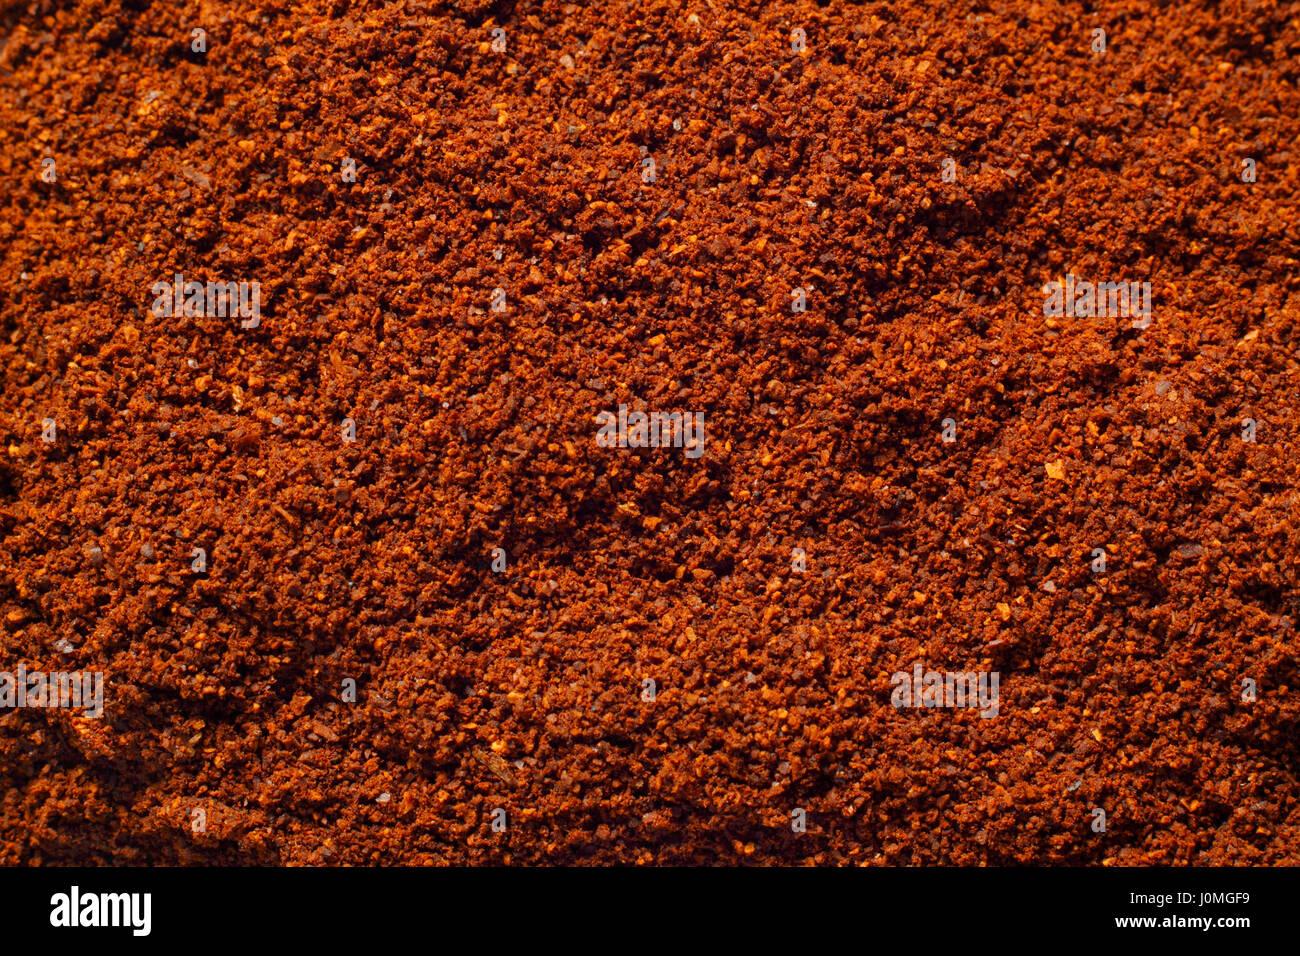 Café molido textura cerca. Full Frame, vista superior. Imagen De Stock